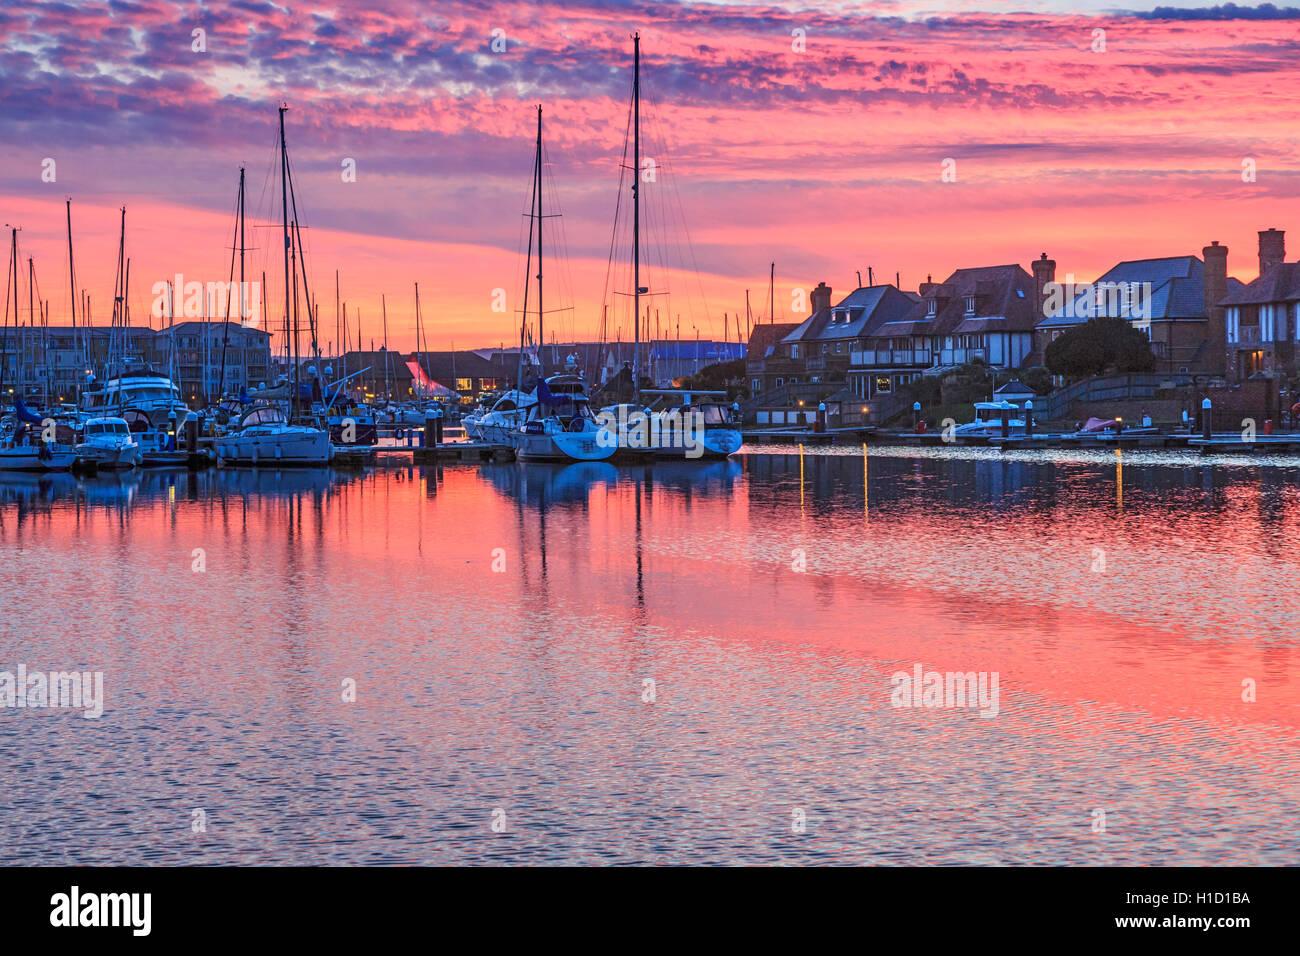 Sovereign Harbour Eastbourne at dusk Sunset - Stock Image